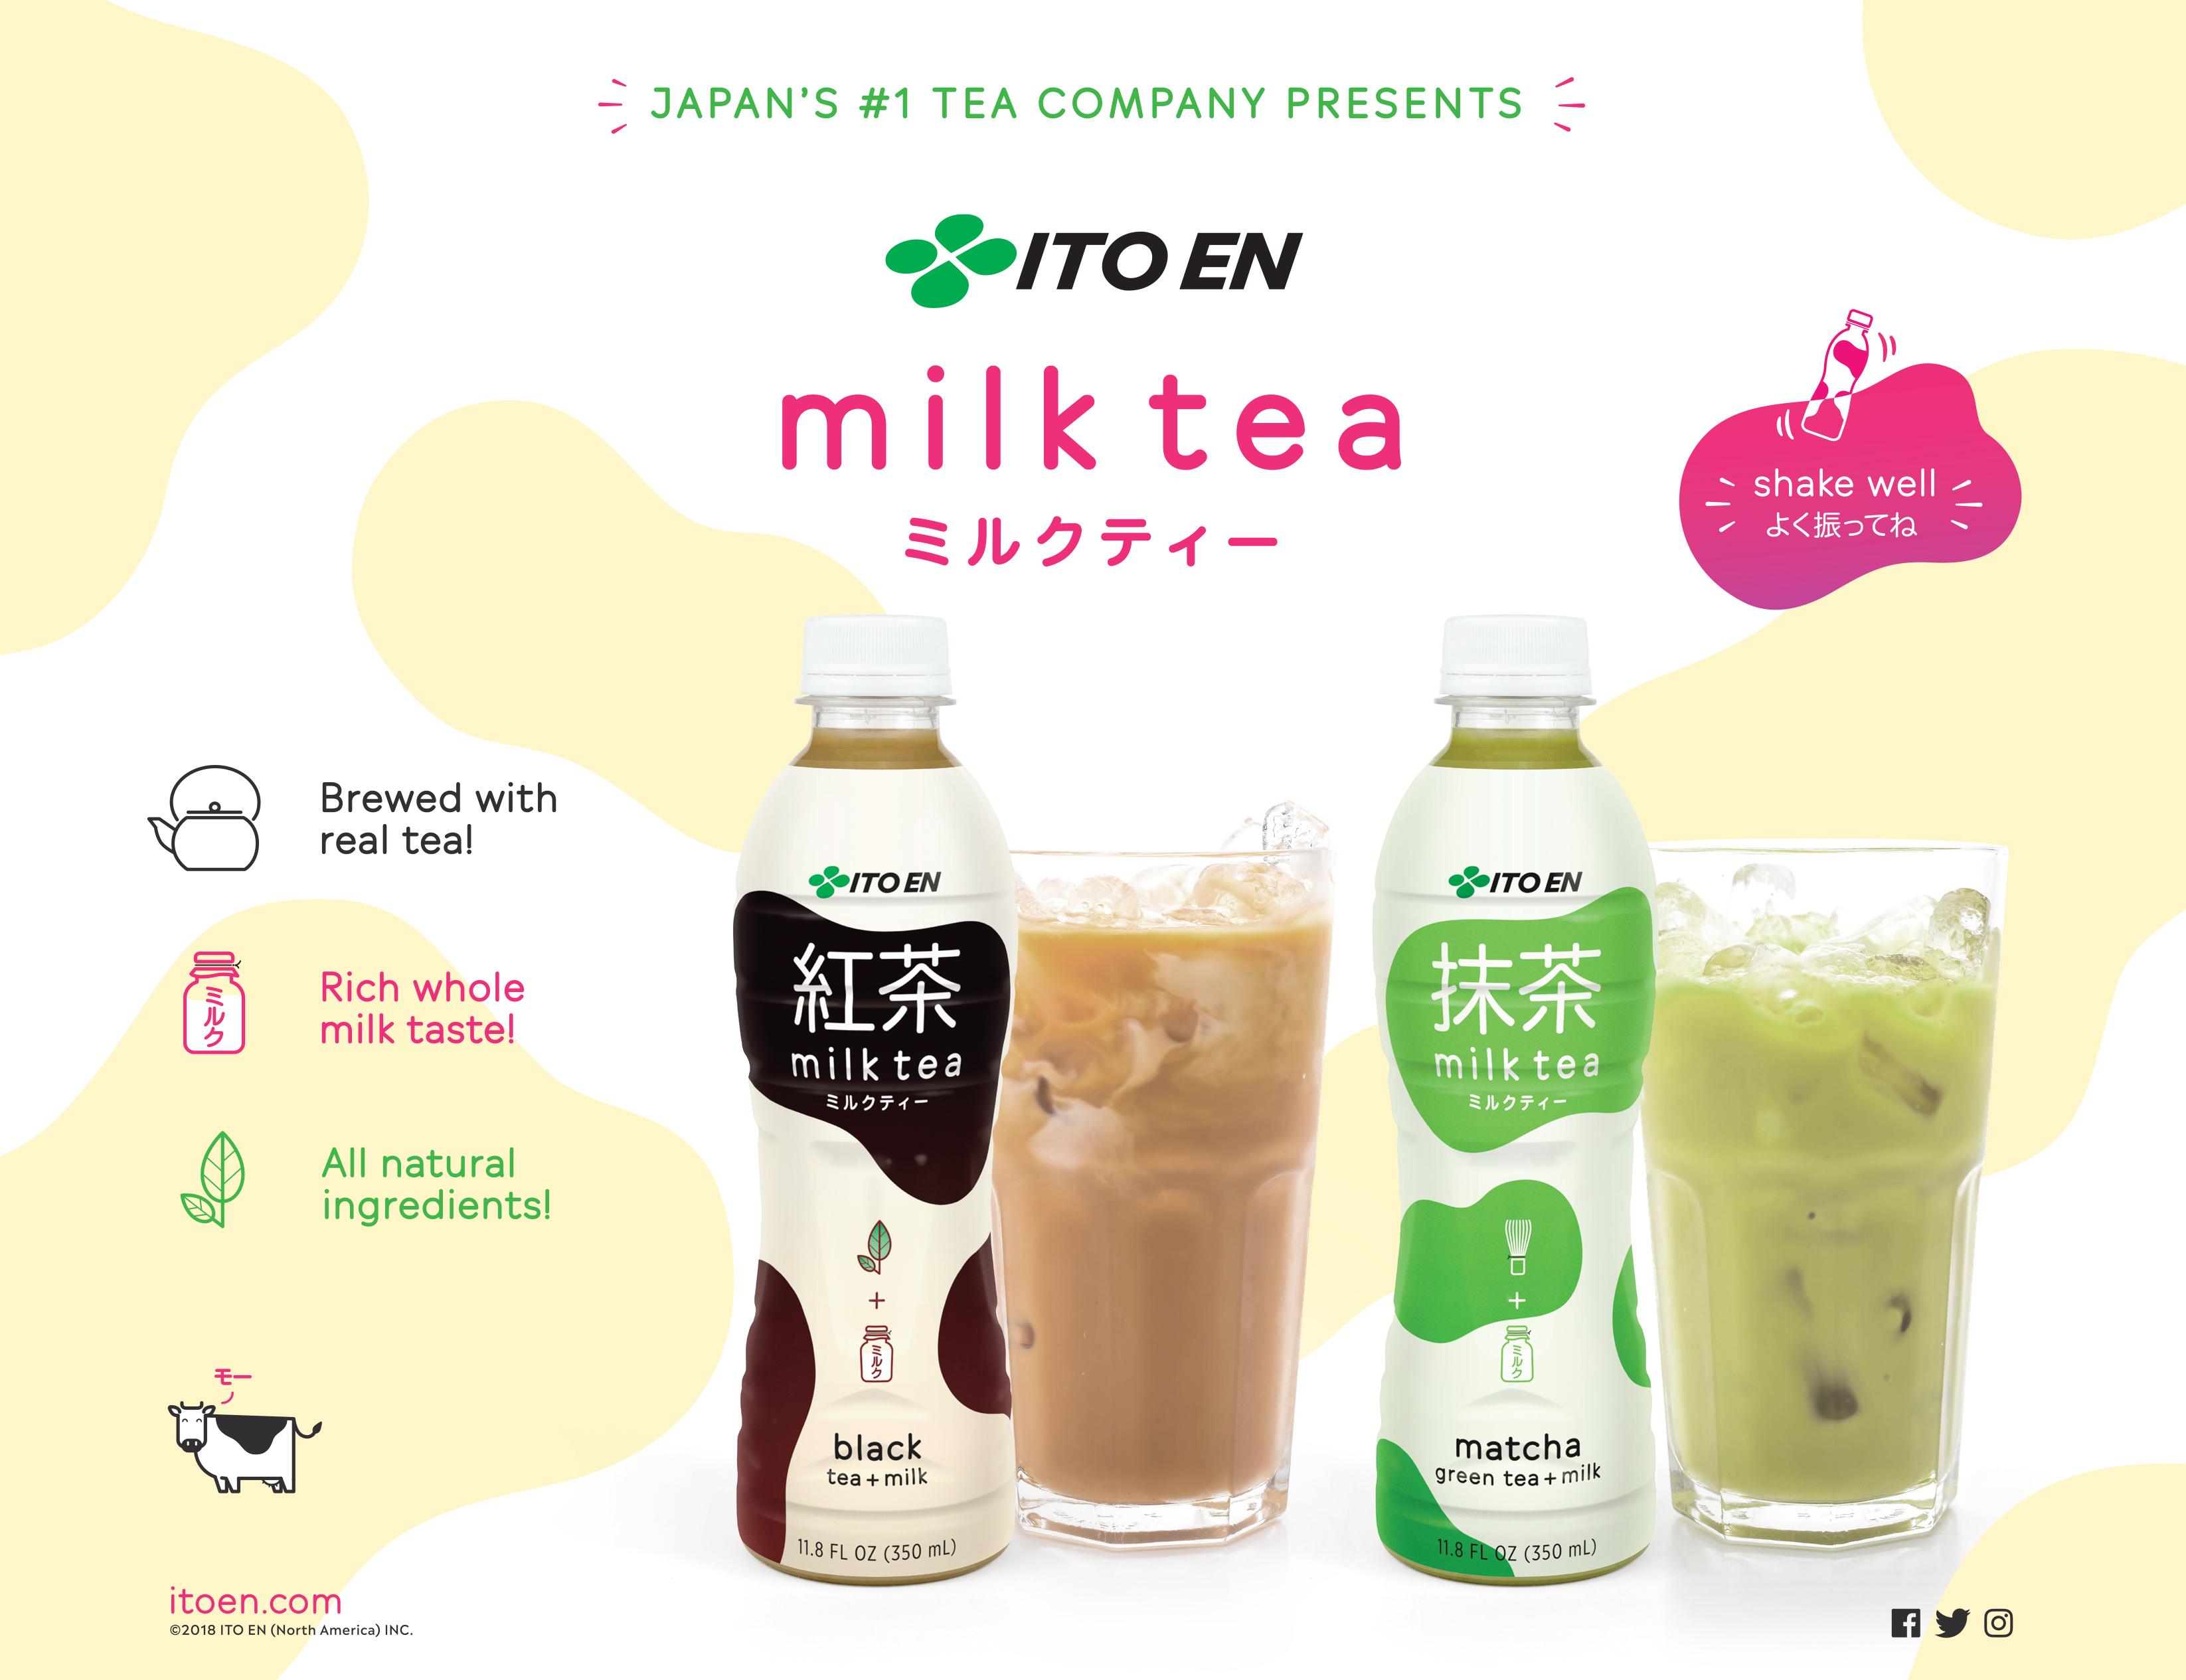 Black Milk Tea 11.8 fl.oz(350ml)